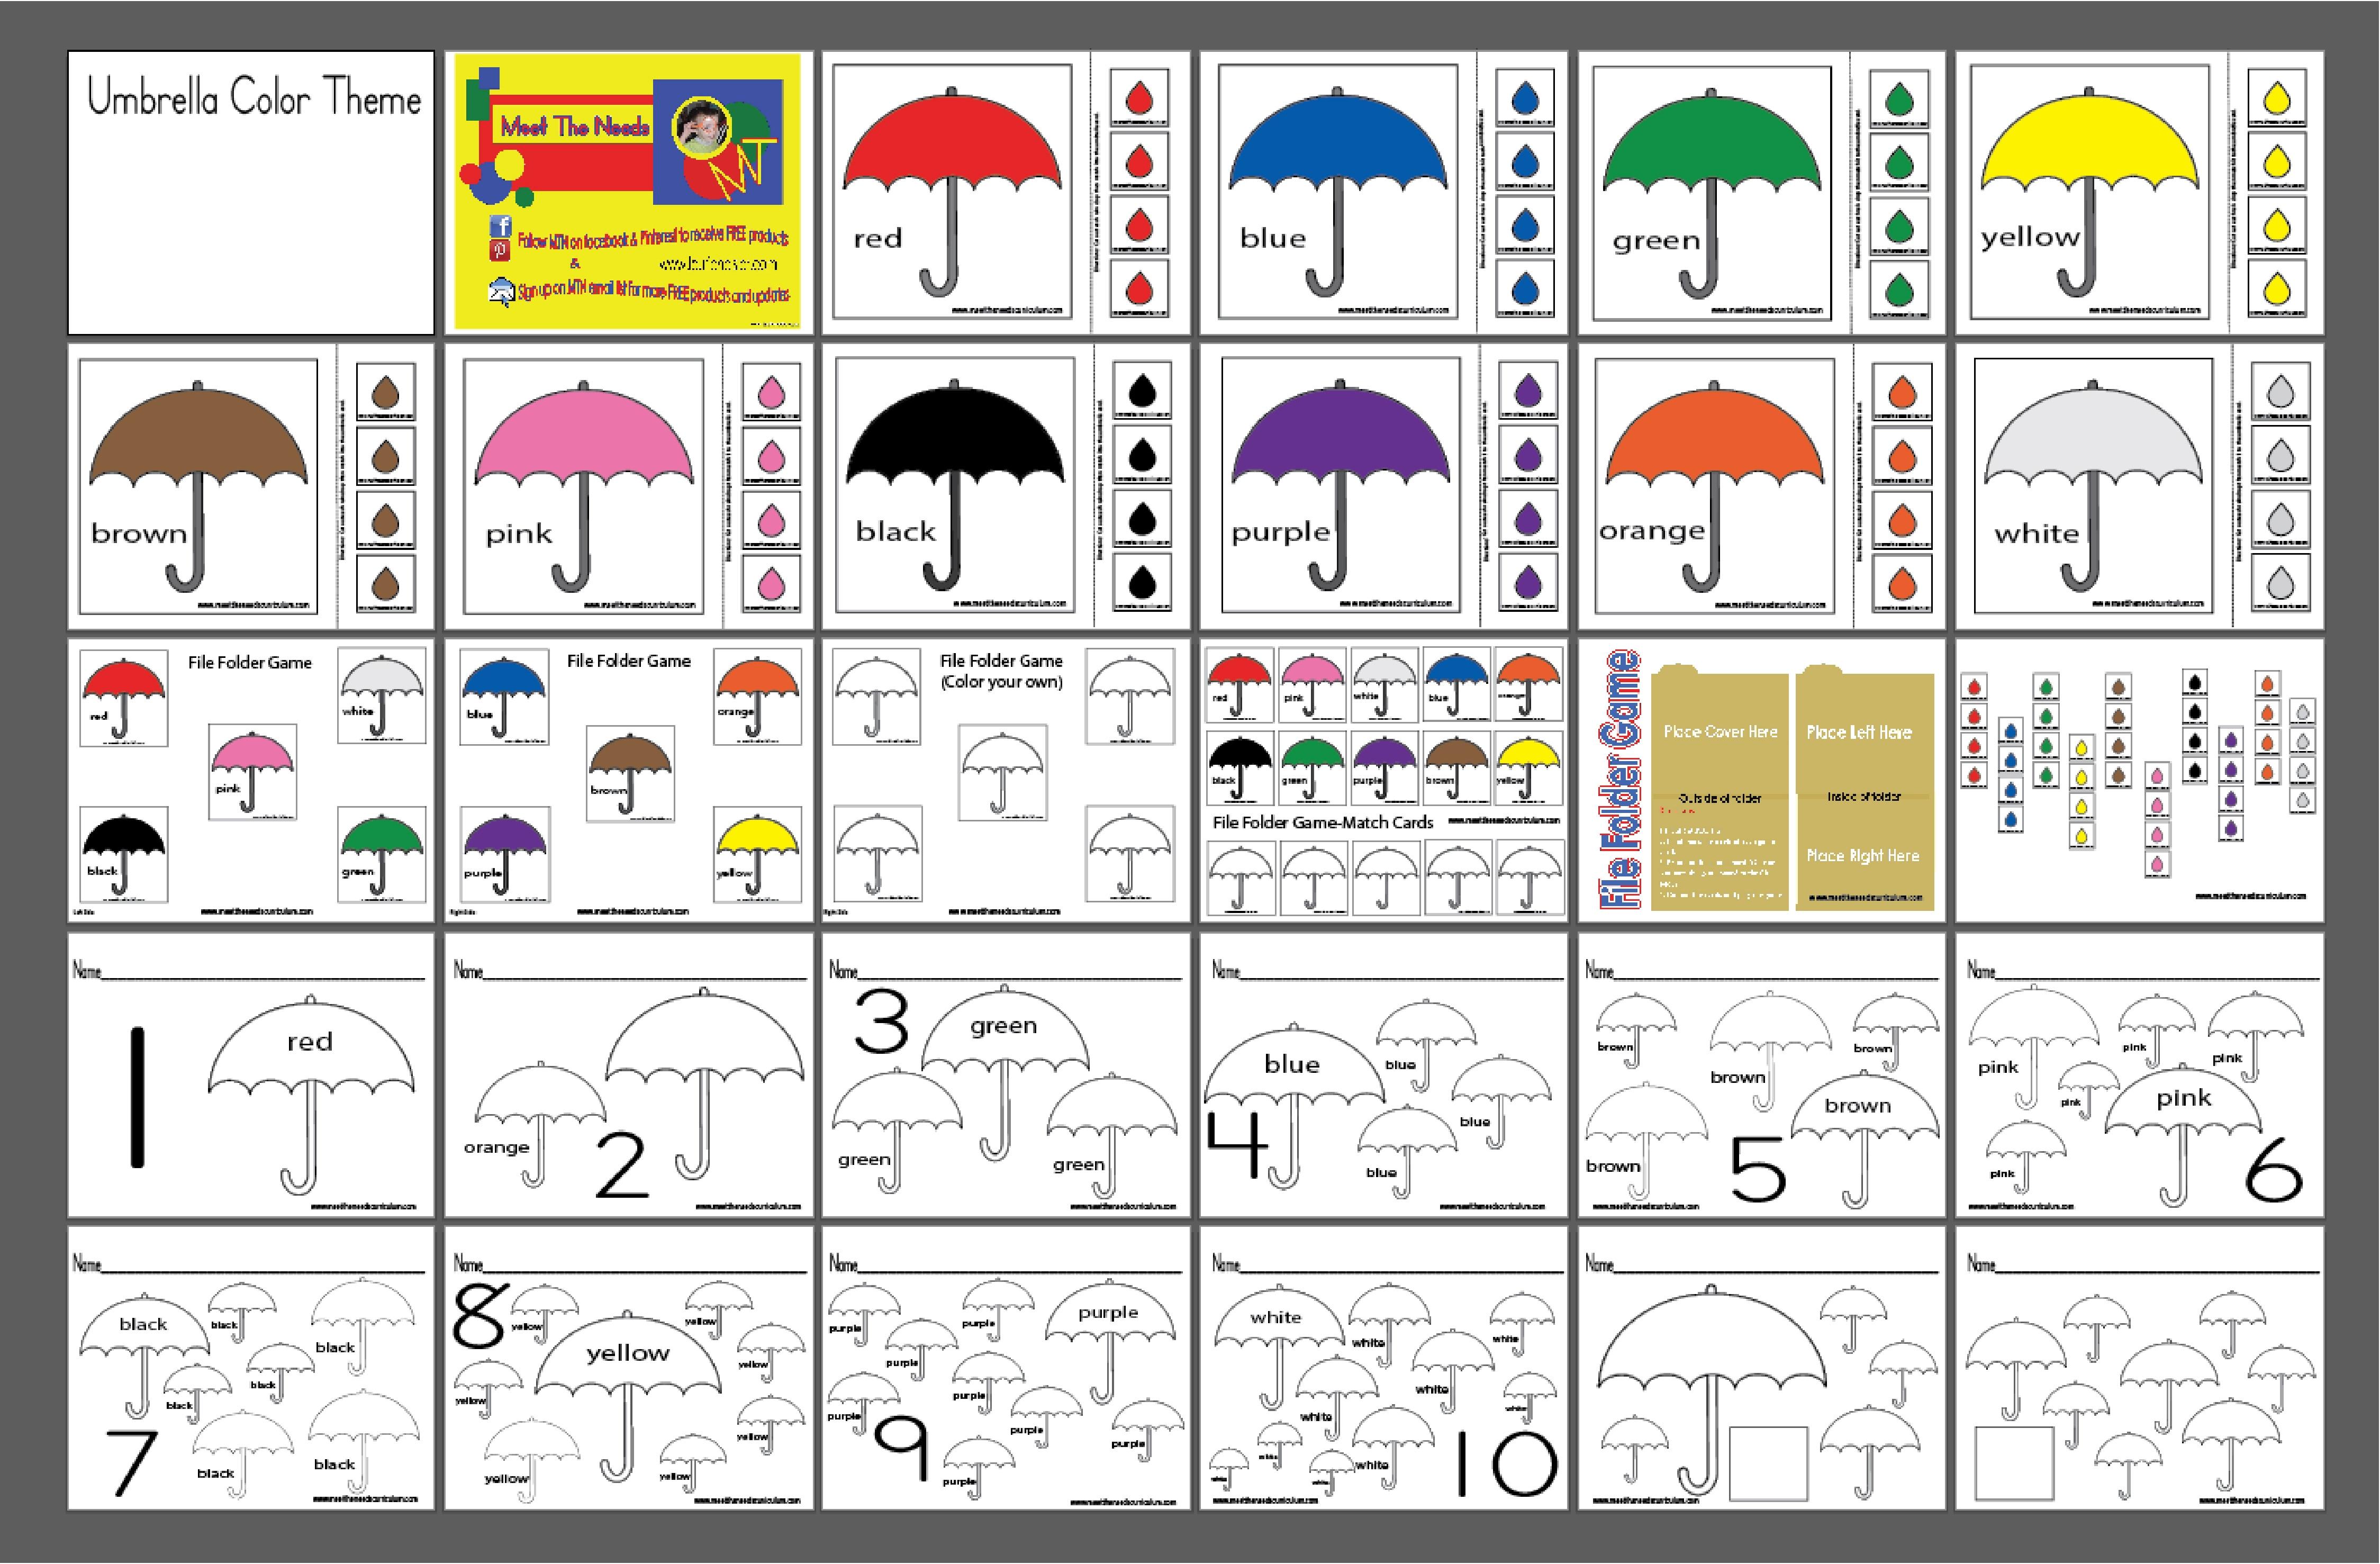 free file folder game templates - umbrella color set file folder game meet the needs